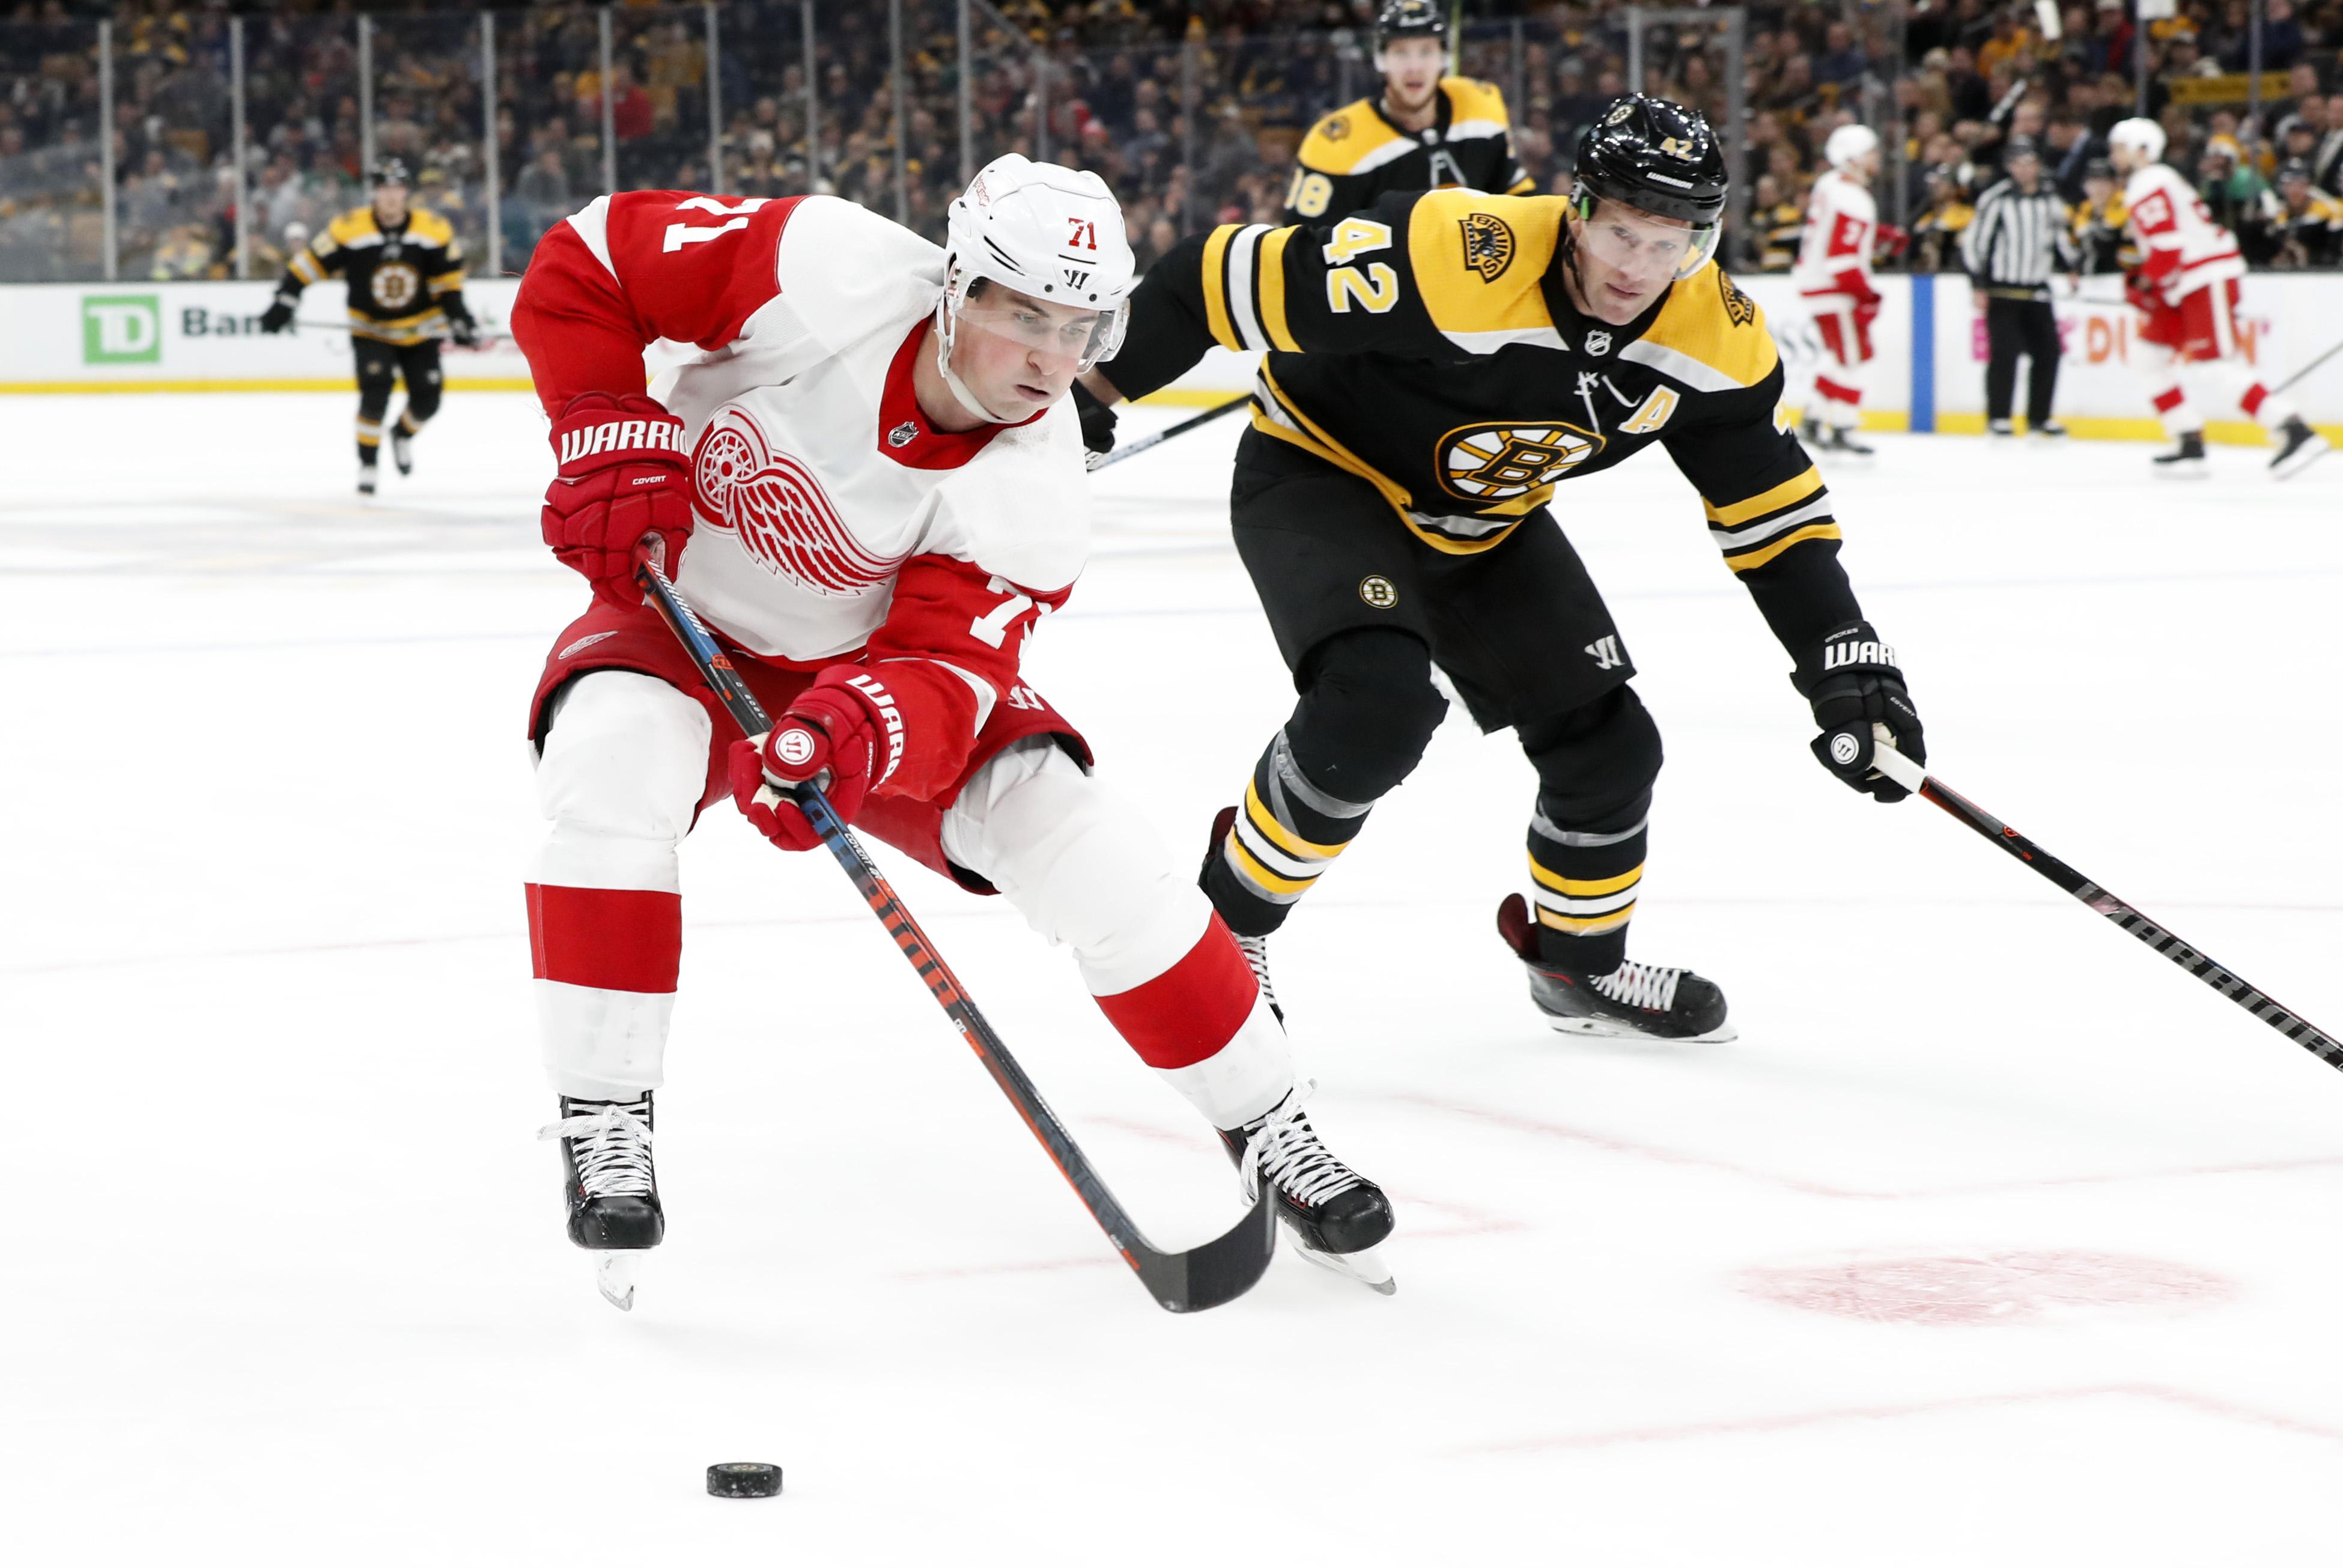 NHL: DEC 01 Red Wings at Bruins